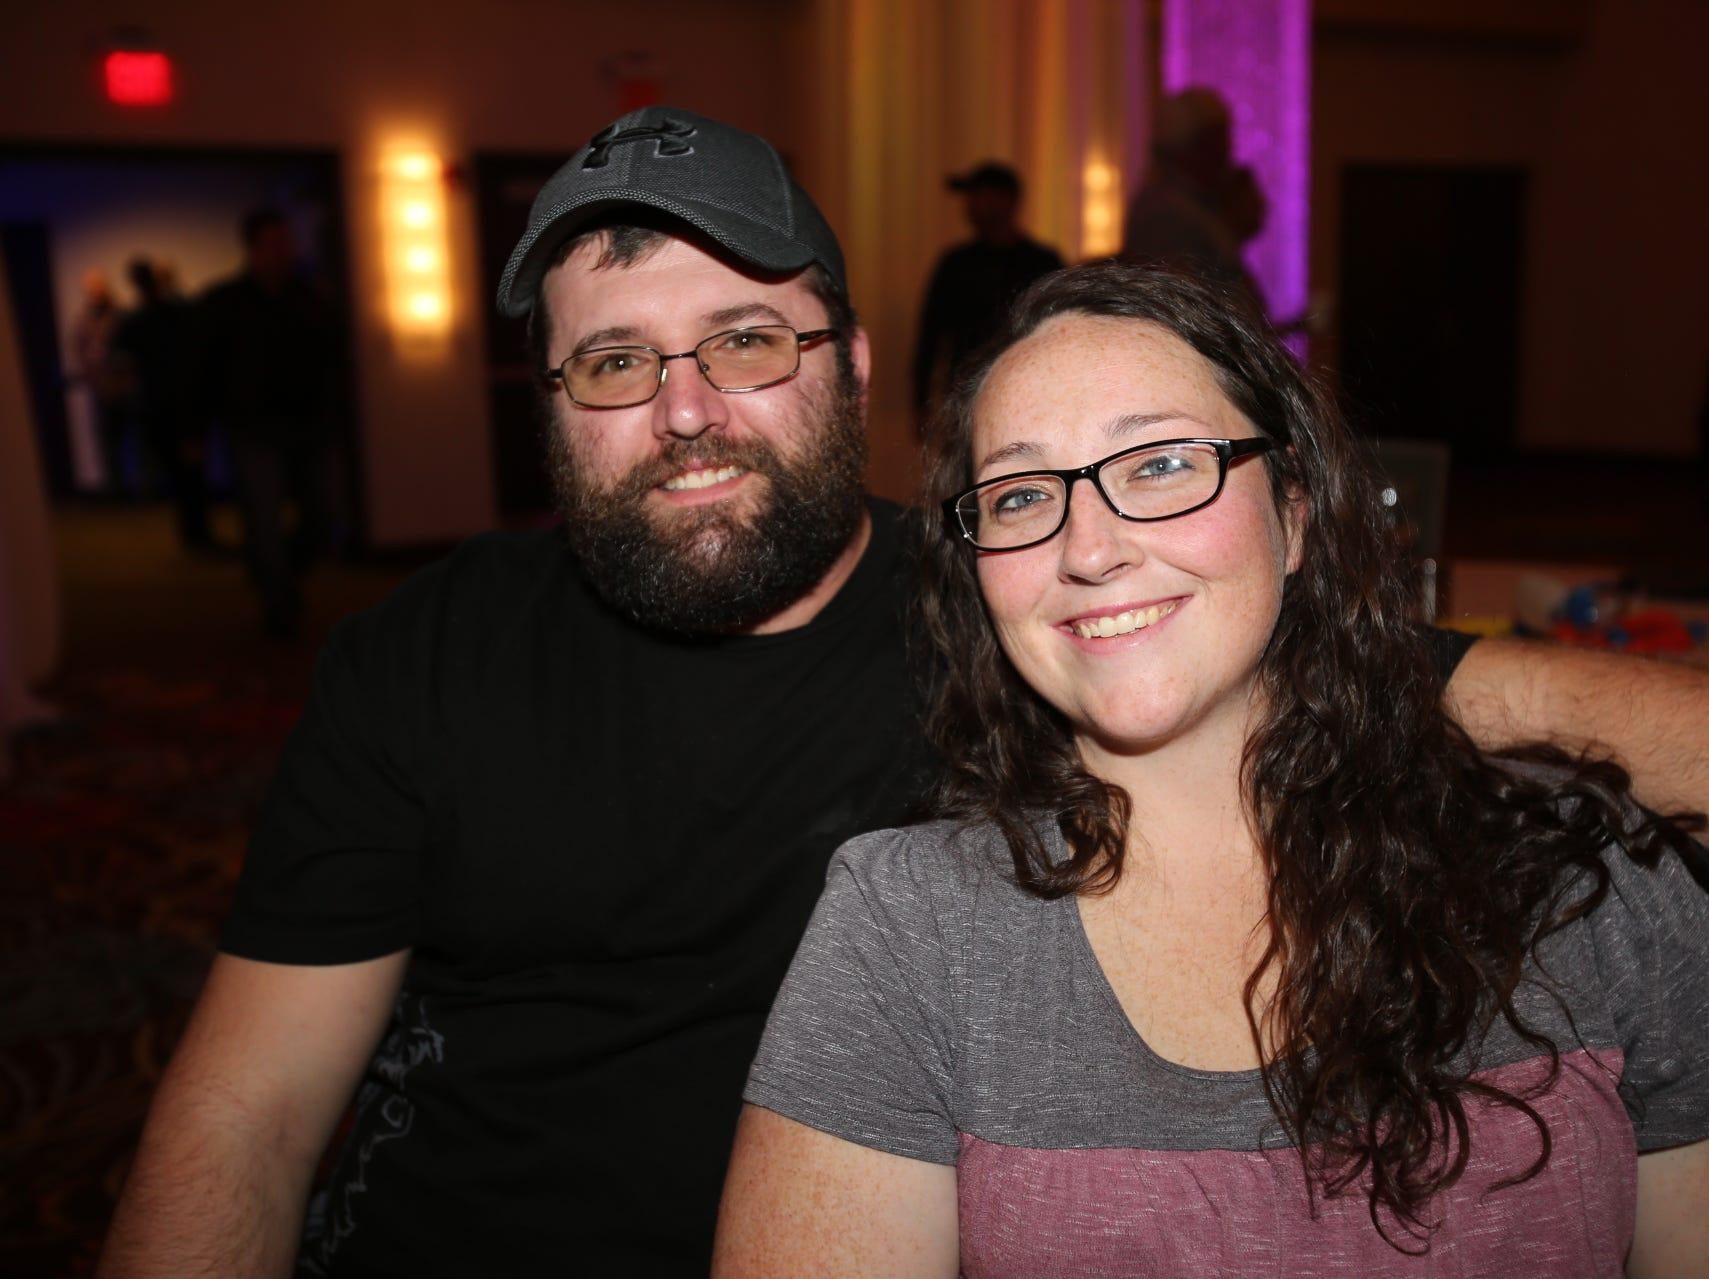 Devon and Chrisy